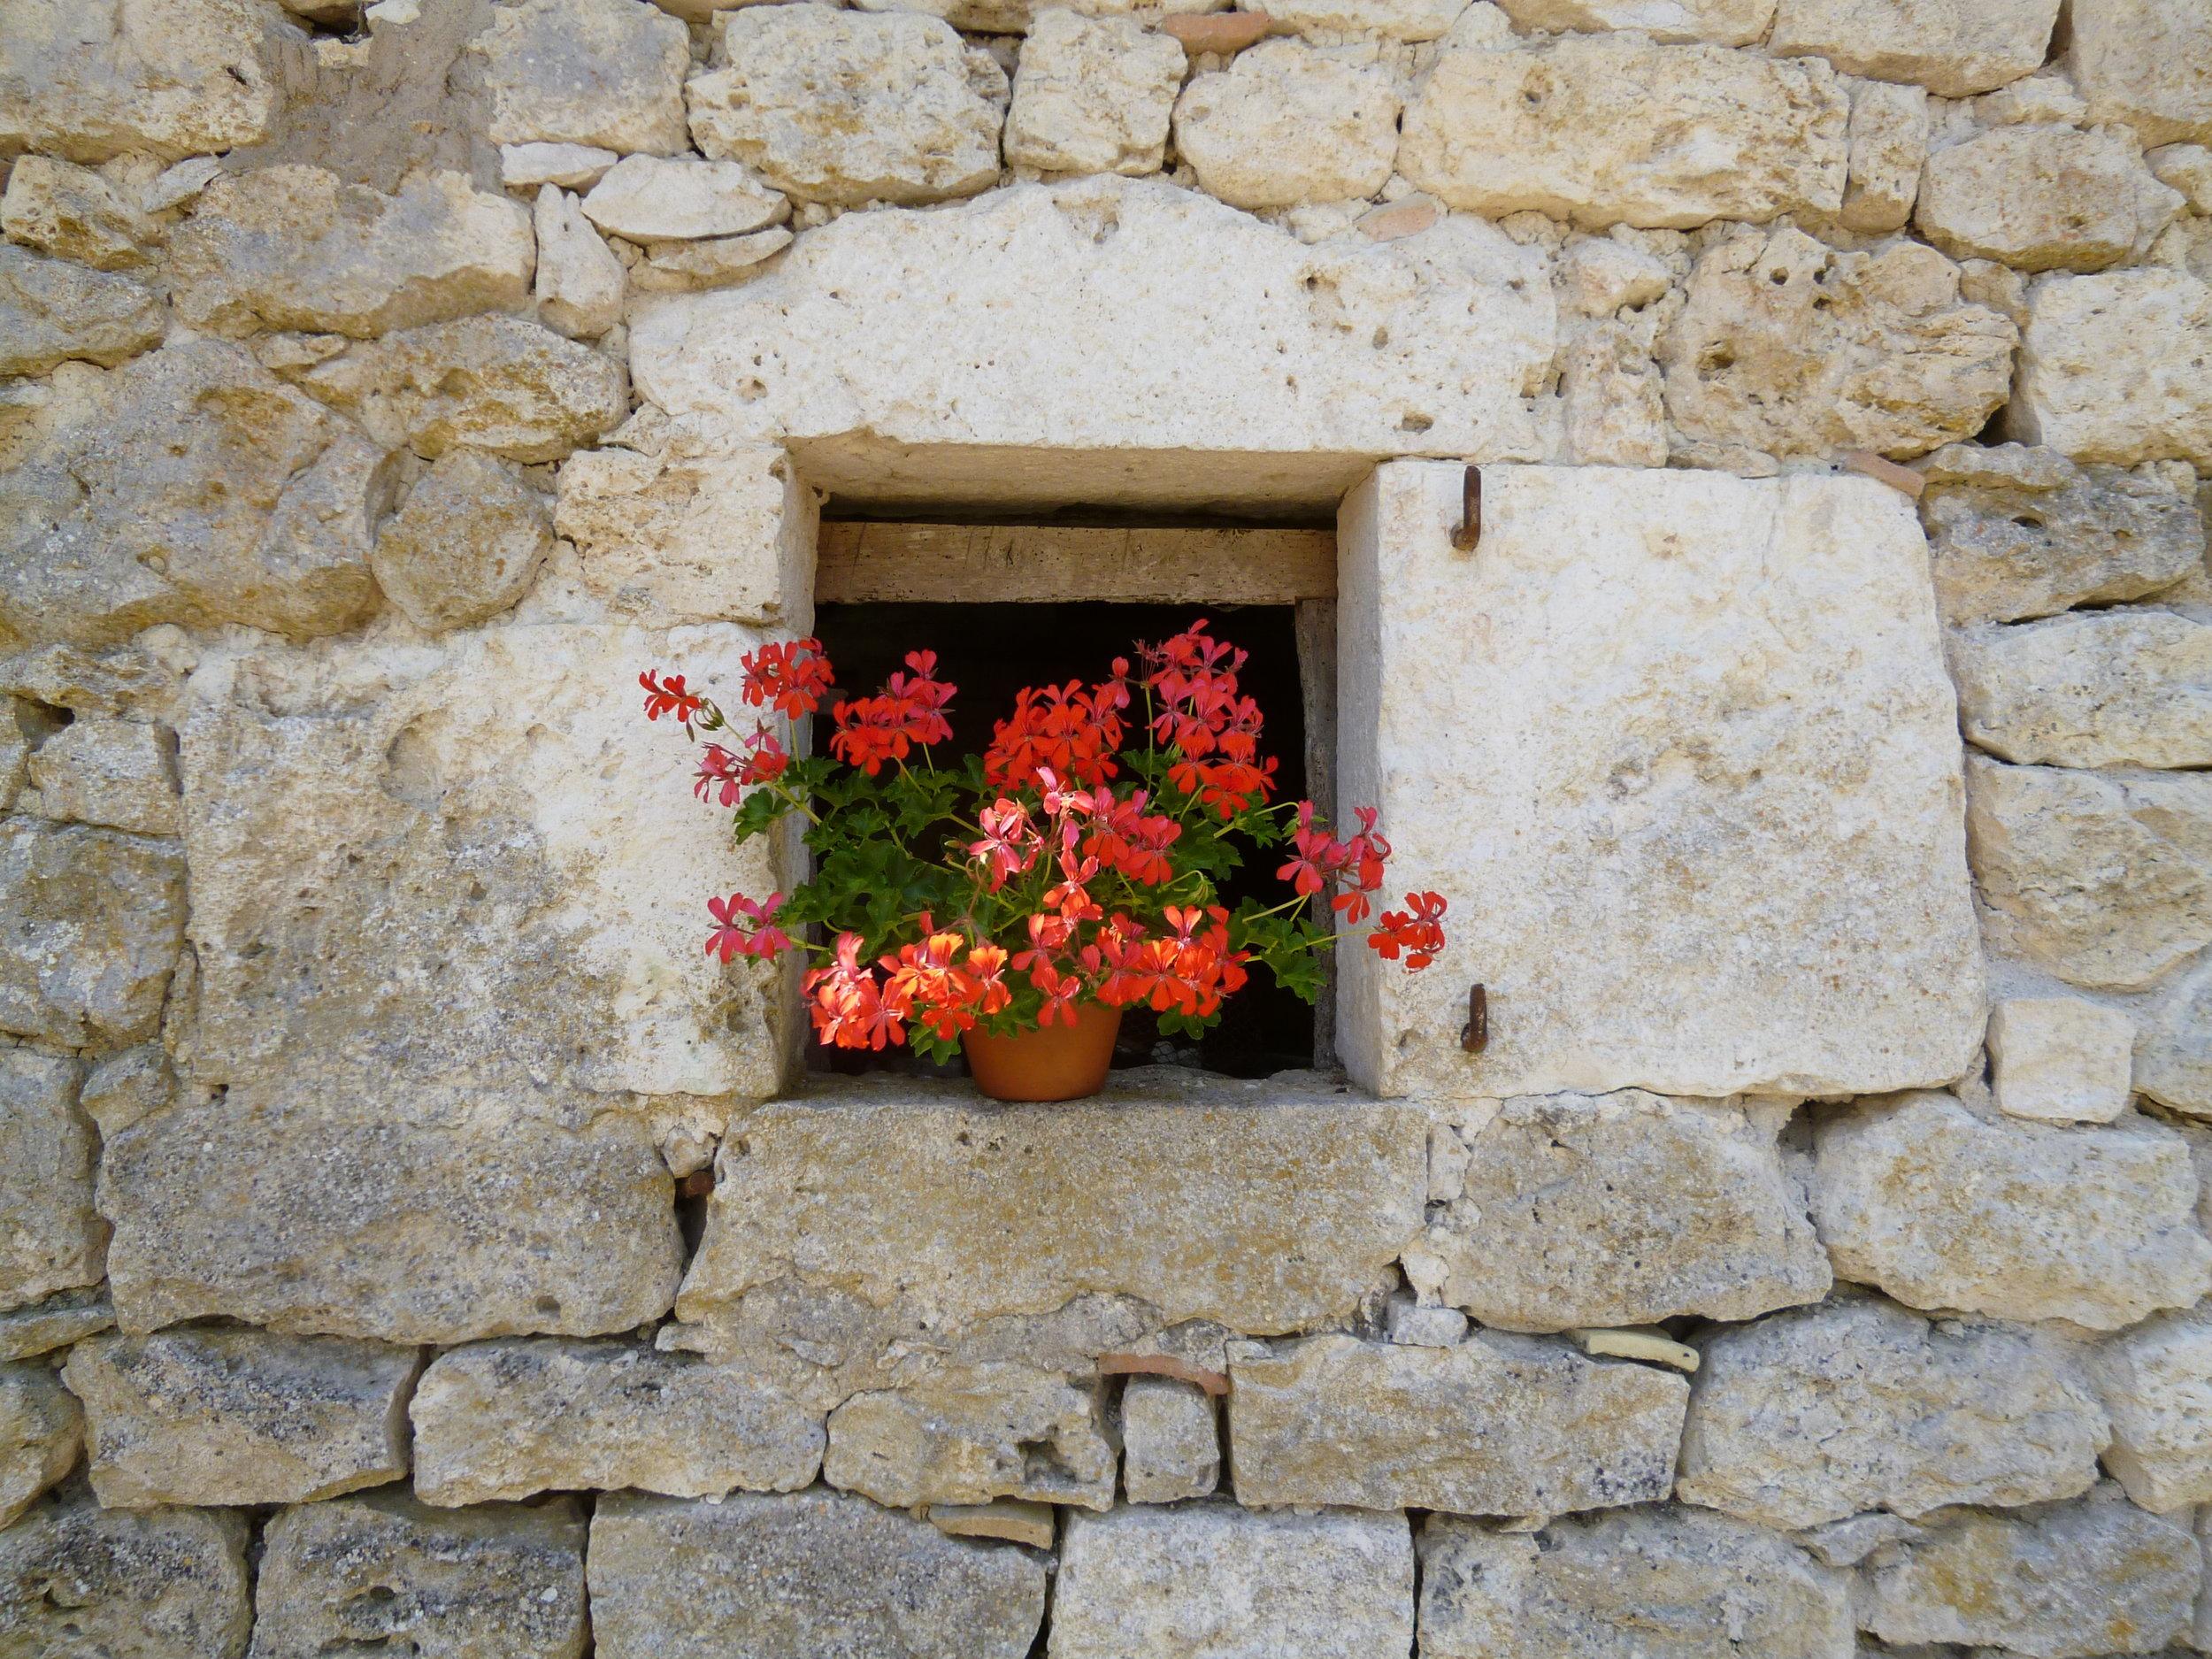 Geraniums in the barn windows.